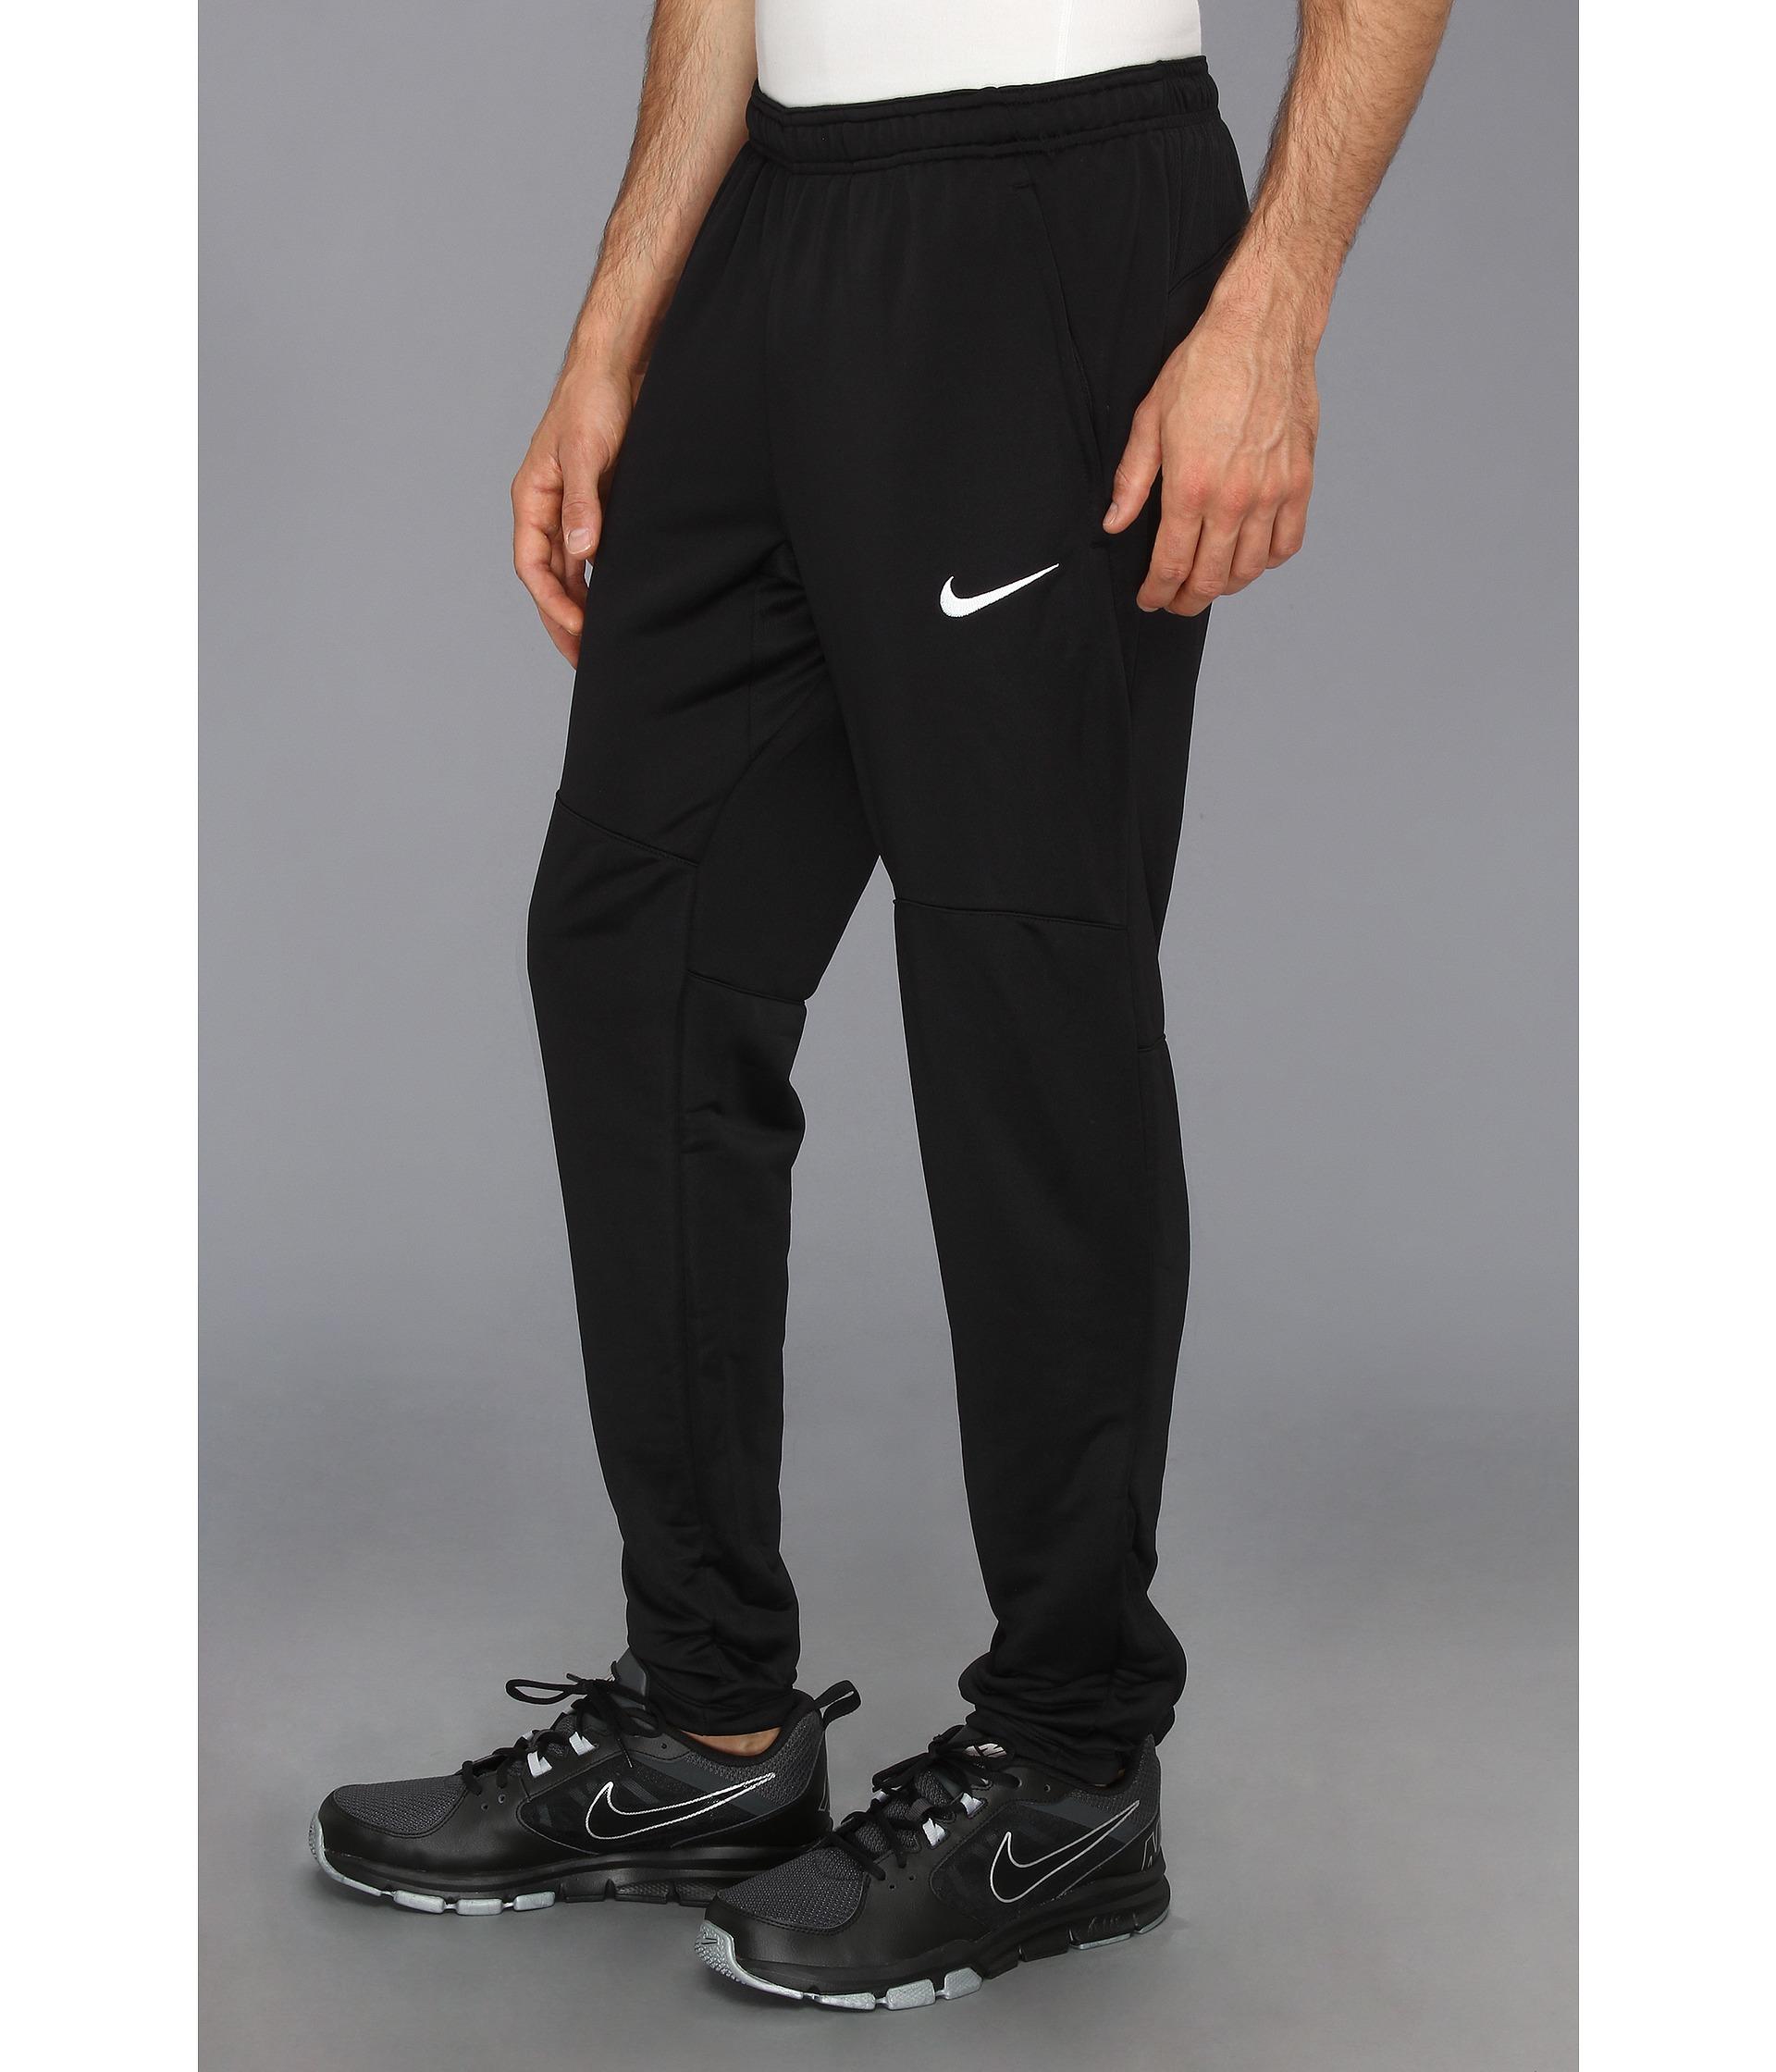 Wonderful Stefans Soccer  Wisconsin  Nike Women39s US Squad Tech Pants